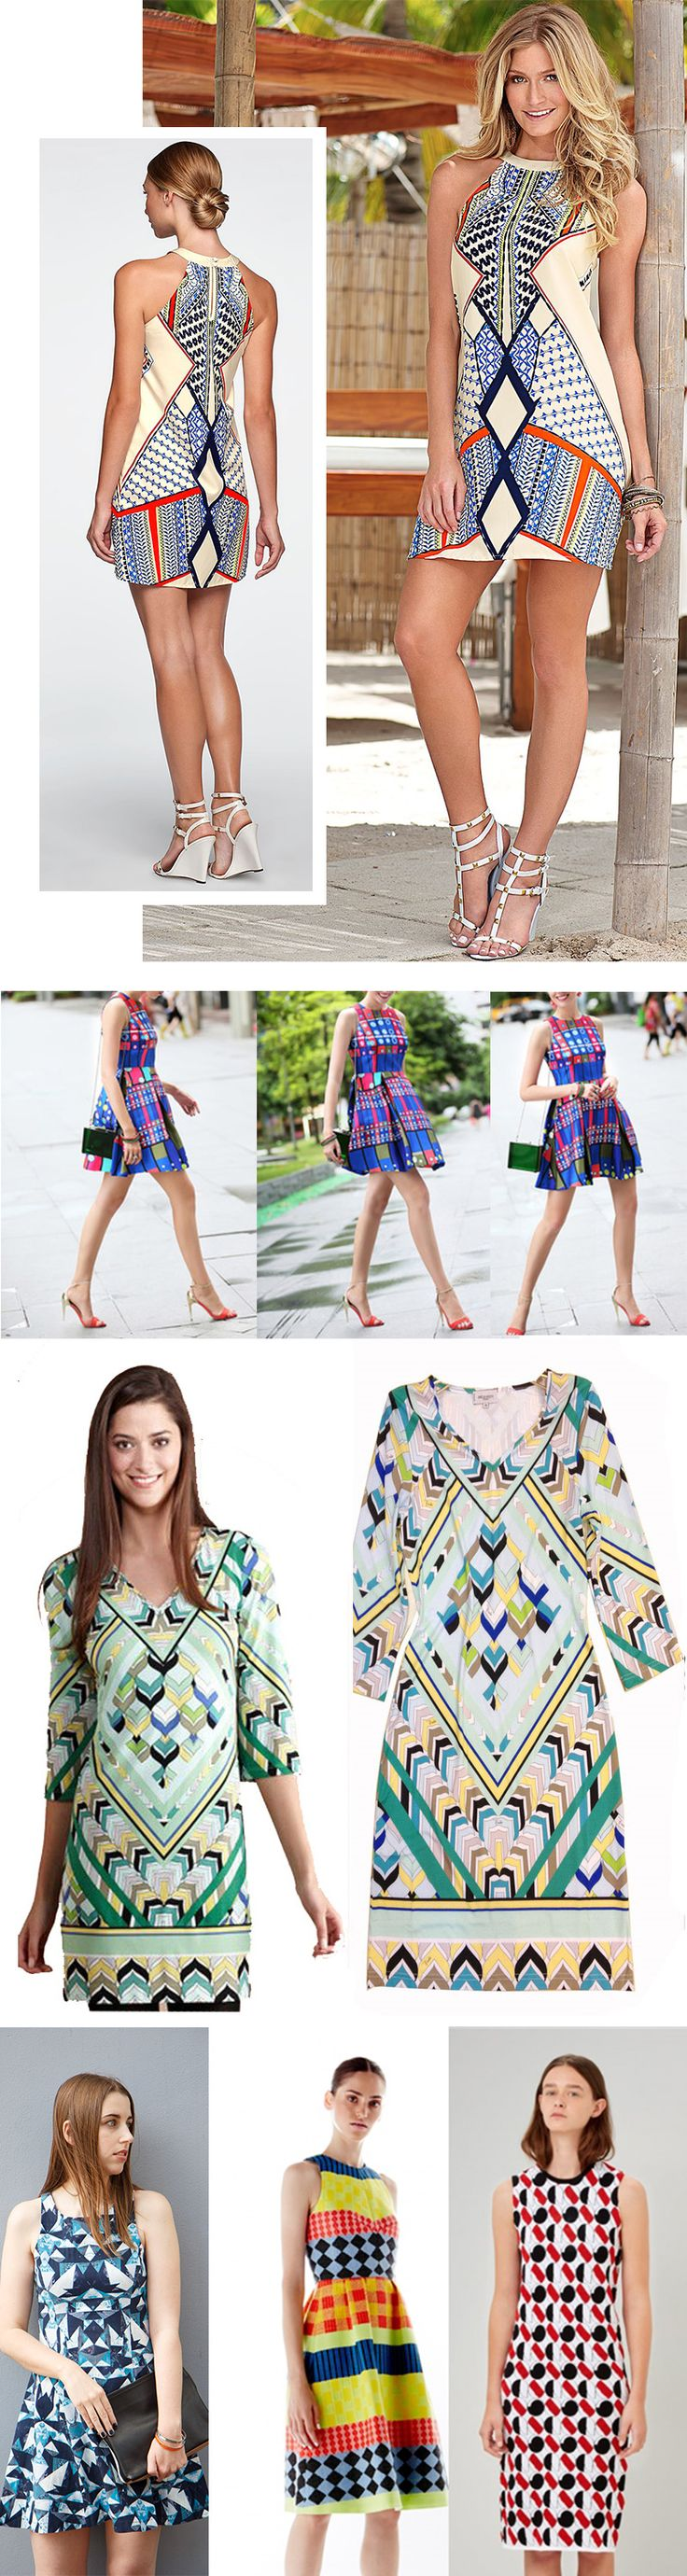 Stylish Women Geometric Print Dresses